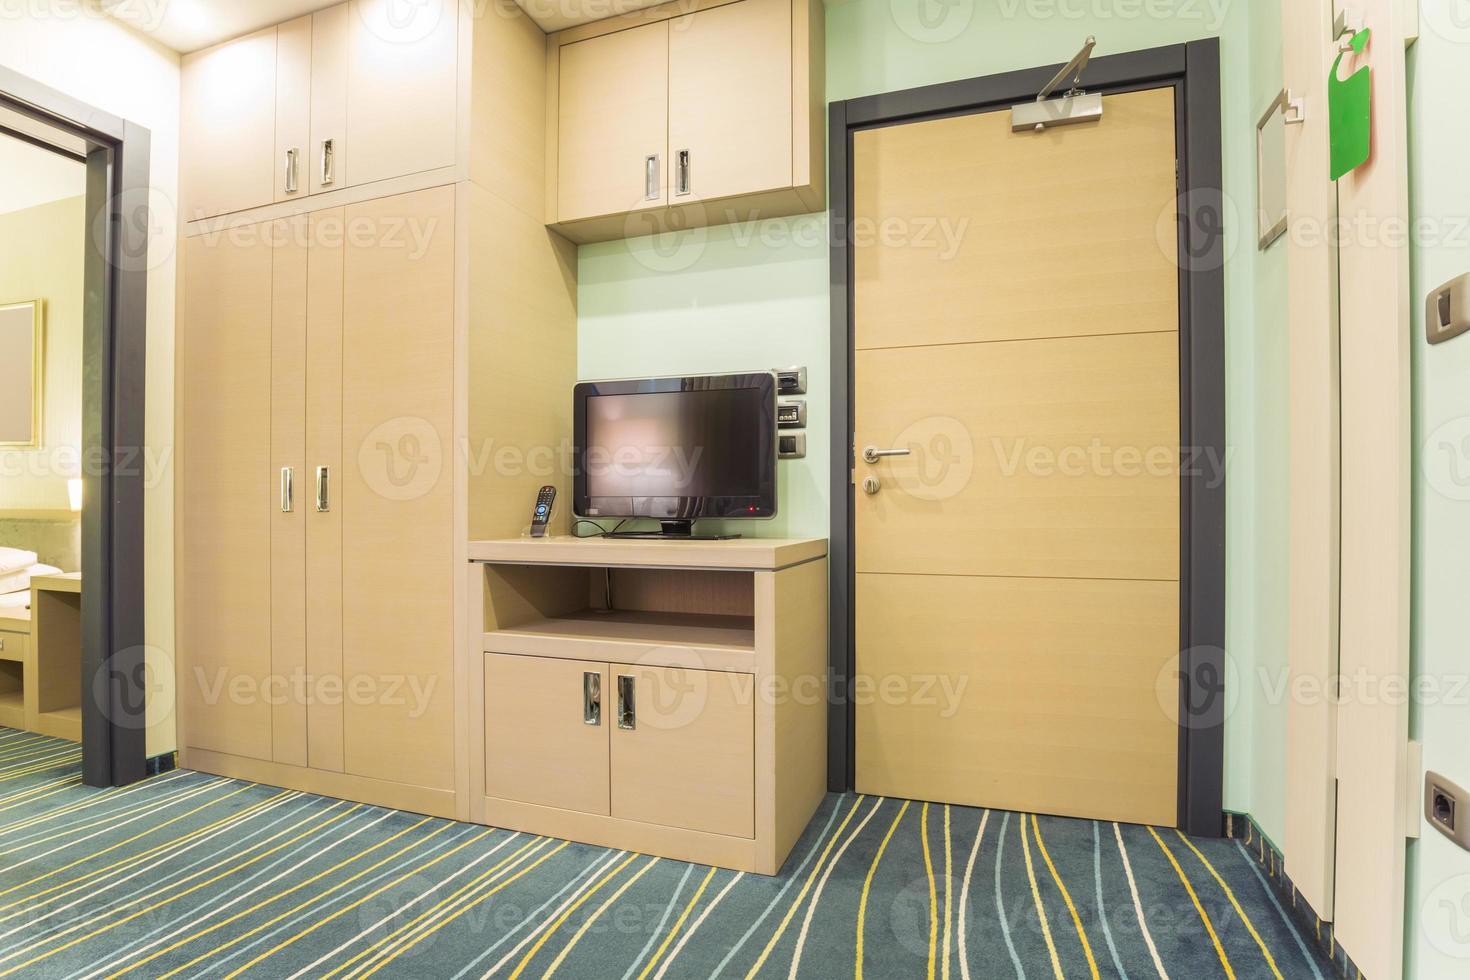 interni eleganti camere d'albergo foto